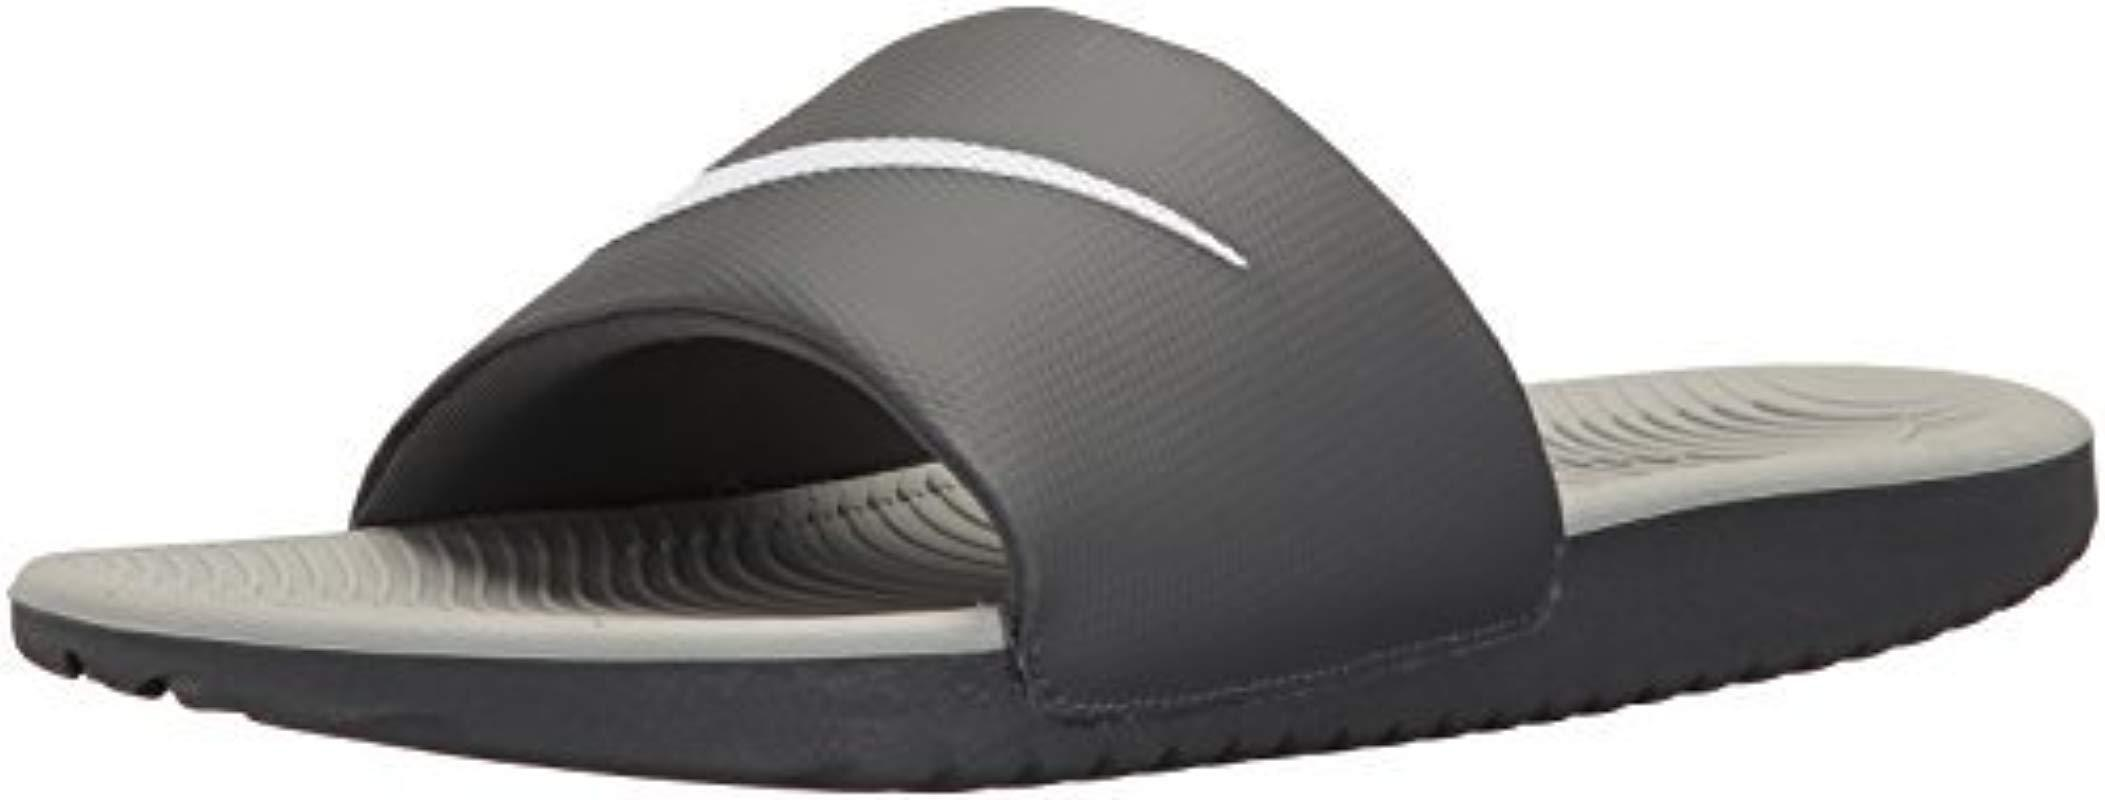 f975c2f267b Lyst - Nike Kawa Slide Athletic Sandal in Gray for Men - Save 20%